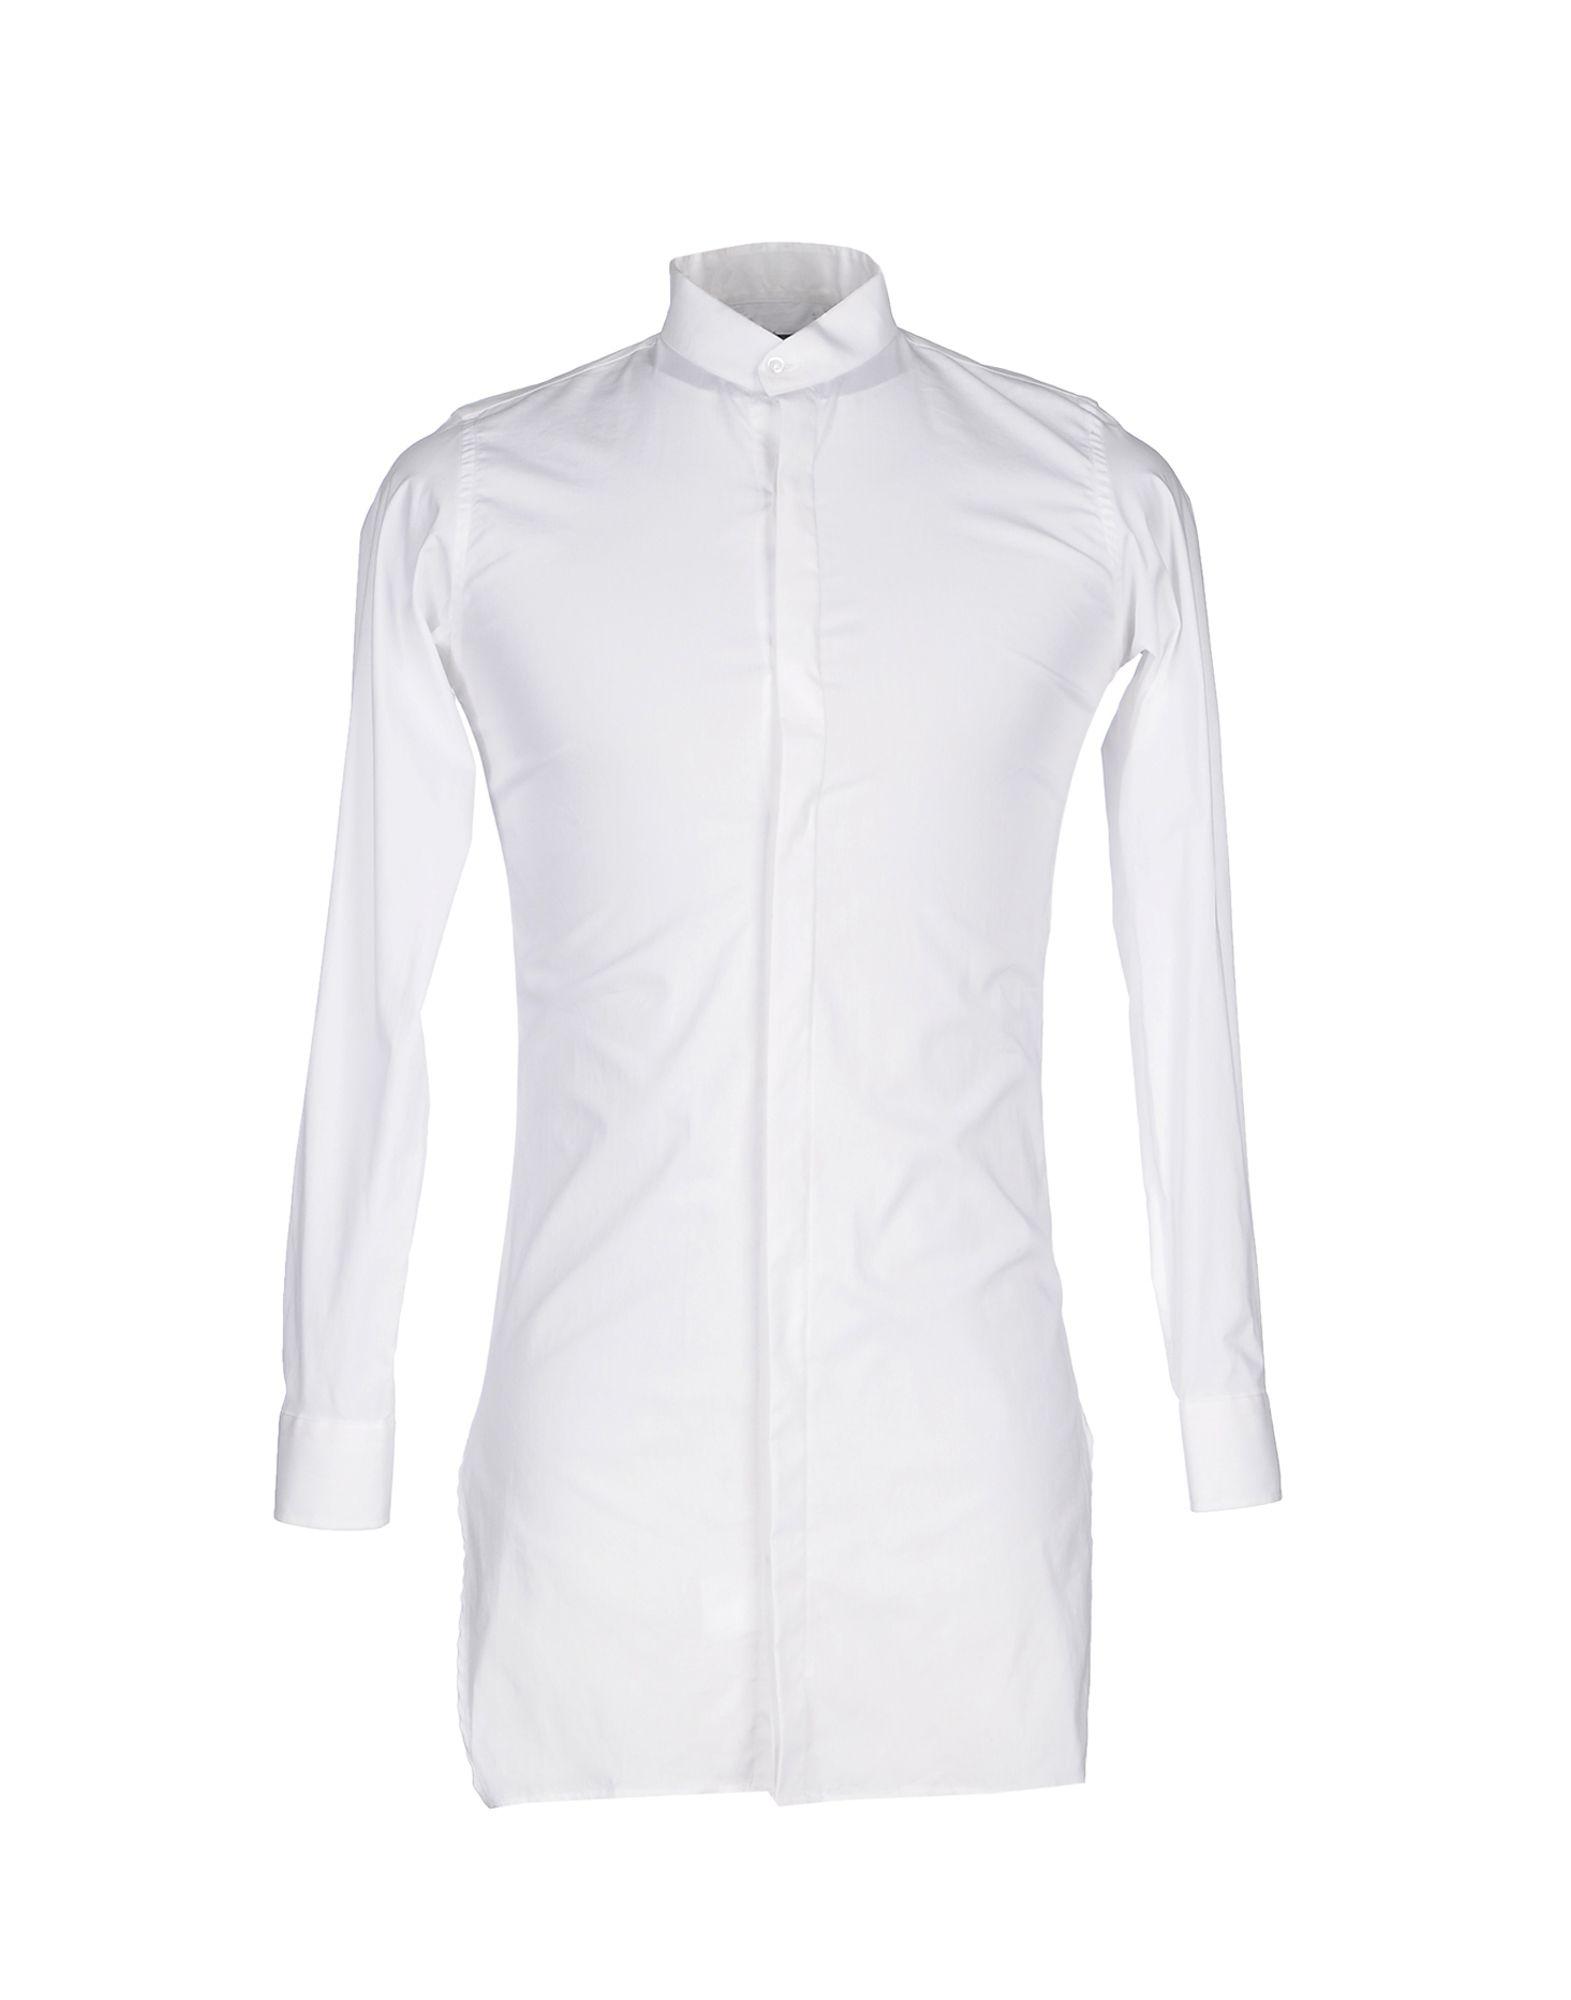 #OUTFIT Pубашка newborn baby boy girl infant warm cotton outfit jumpsuit romper bodysuit clothes